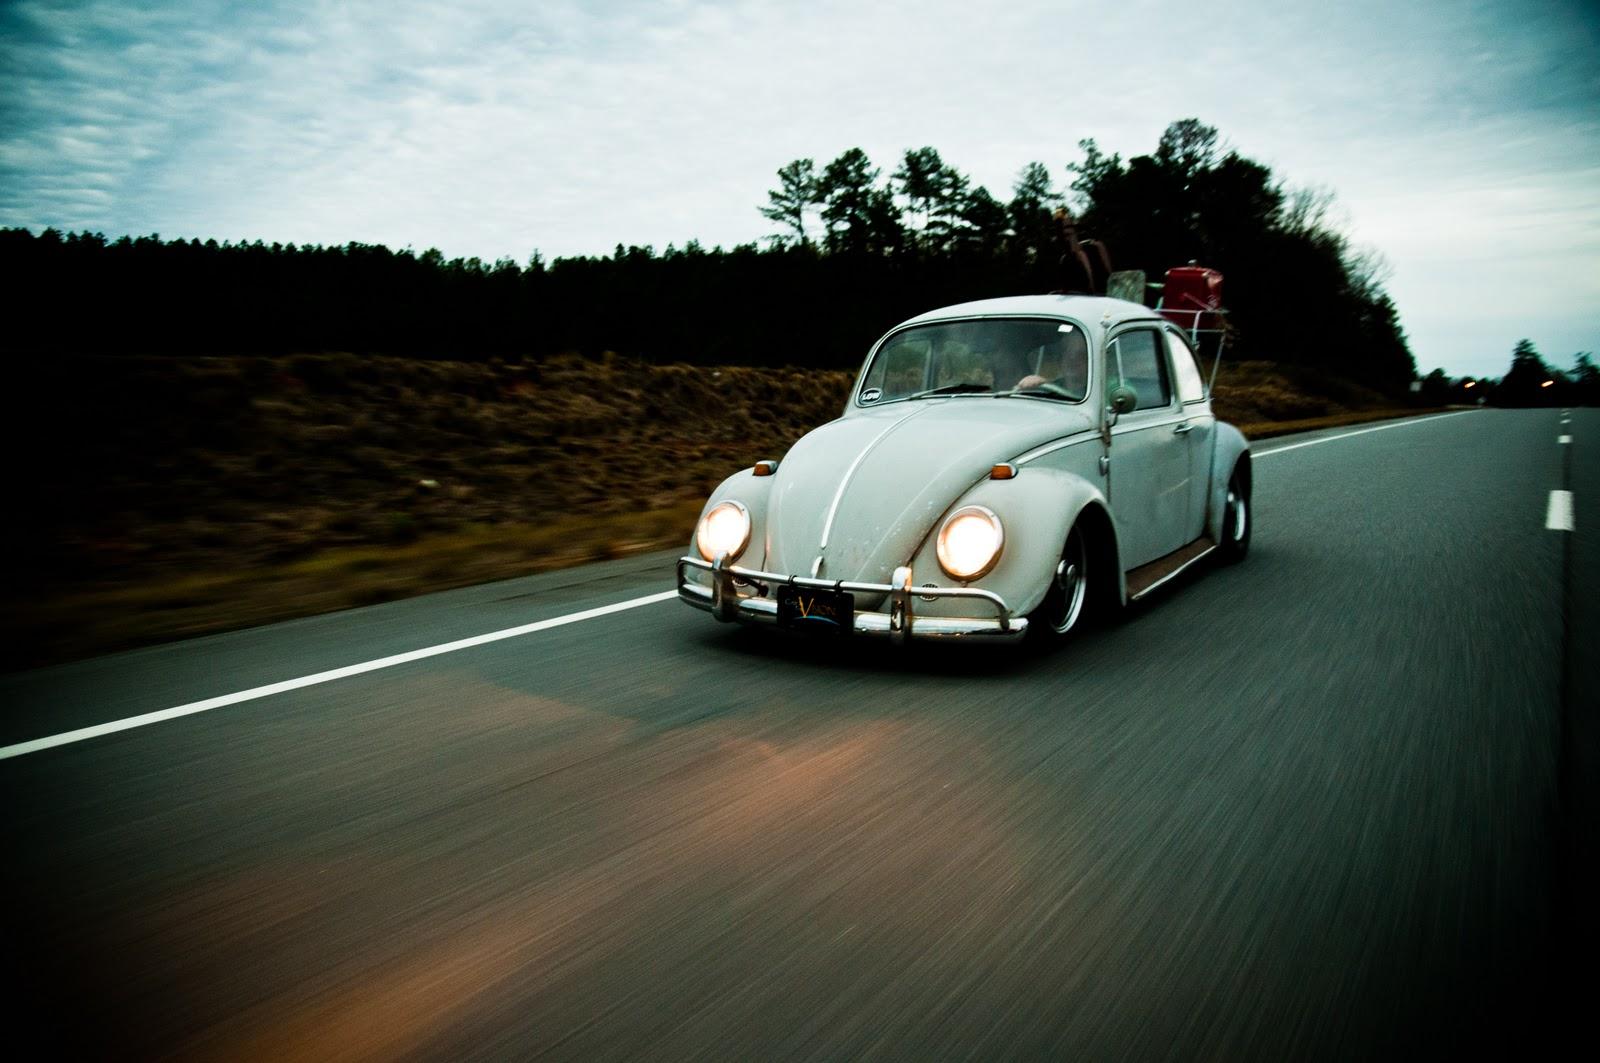 Otis - my '65 Beetle DSC_0065